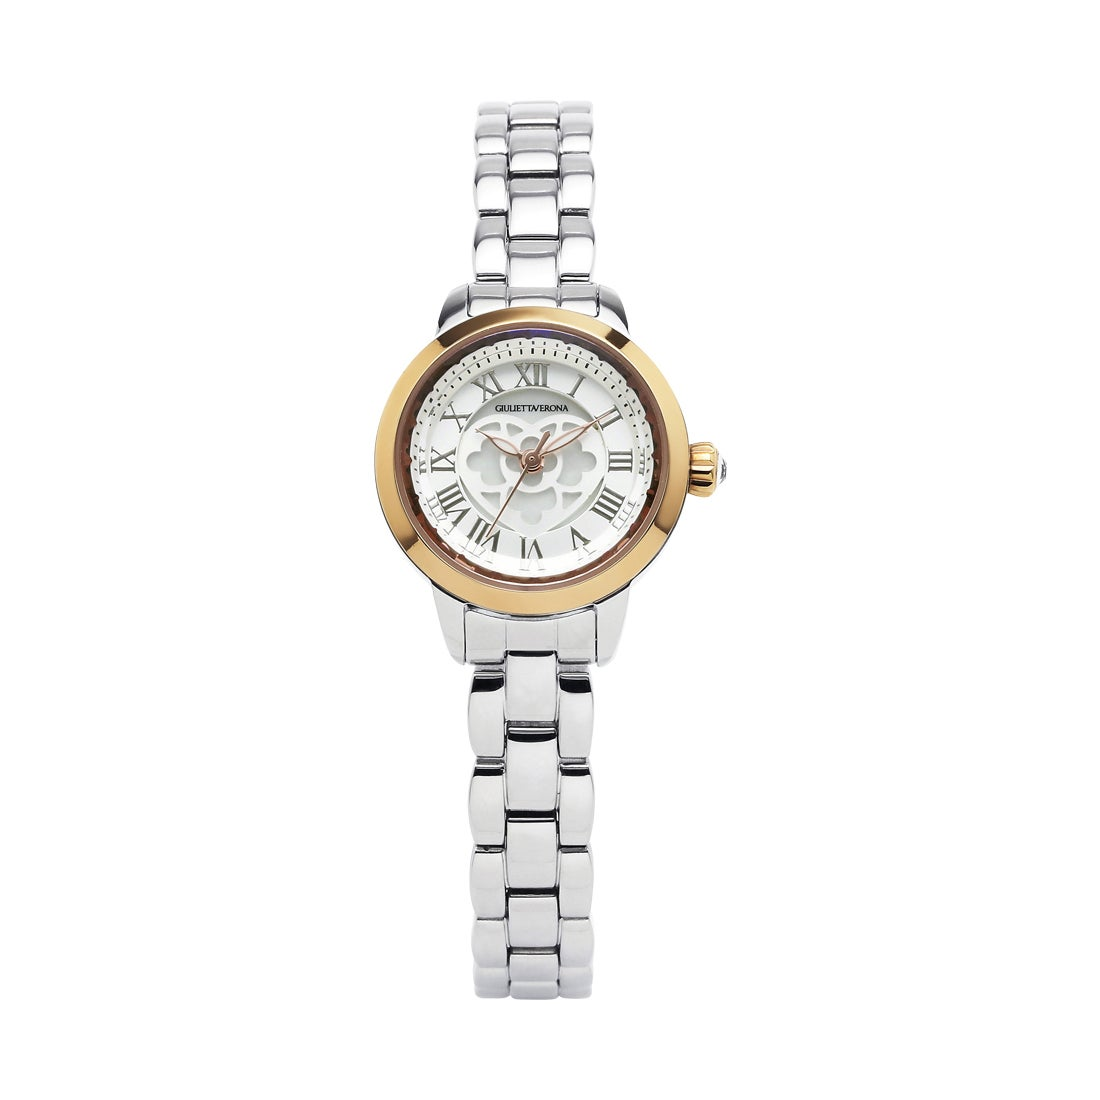 【SAC'S BAR】ジュリエッタヴェローナ GIULIETTAVERONA 腕時計 GV003T LOVE VERONA シルバー×シルバー